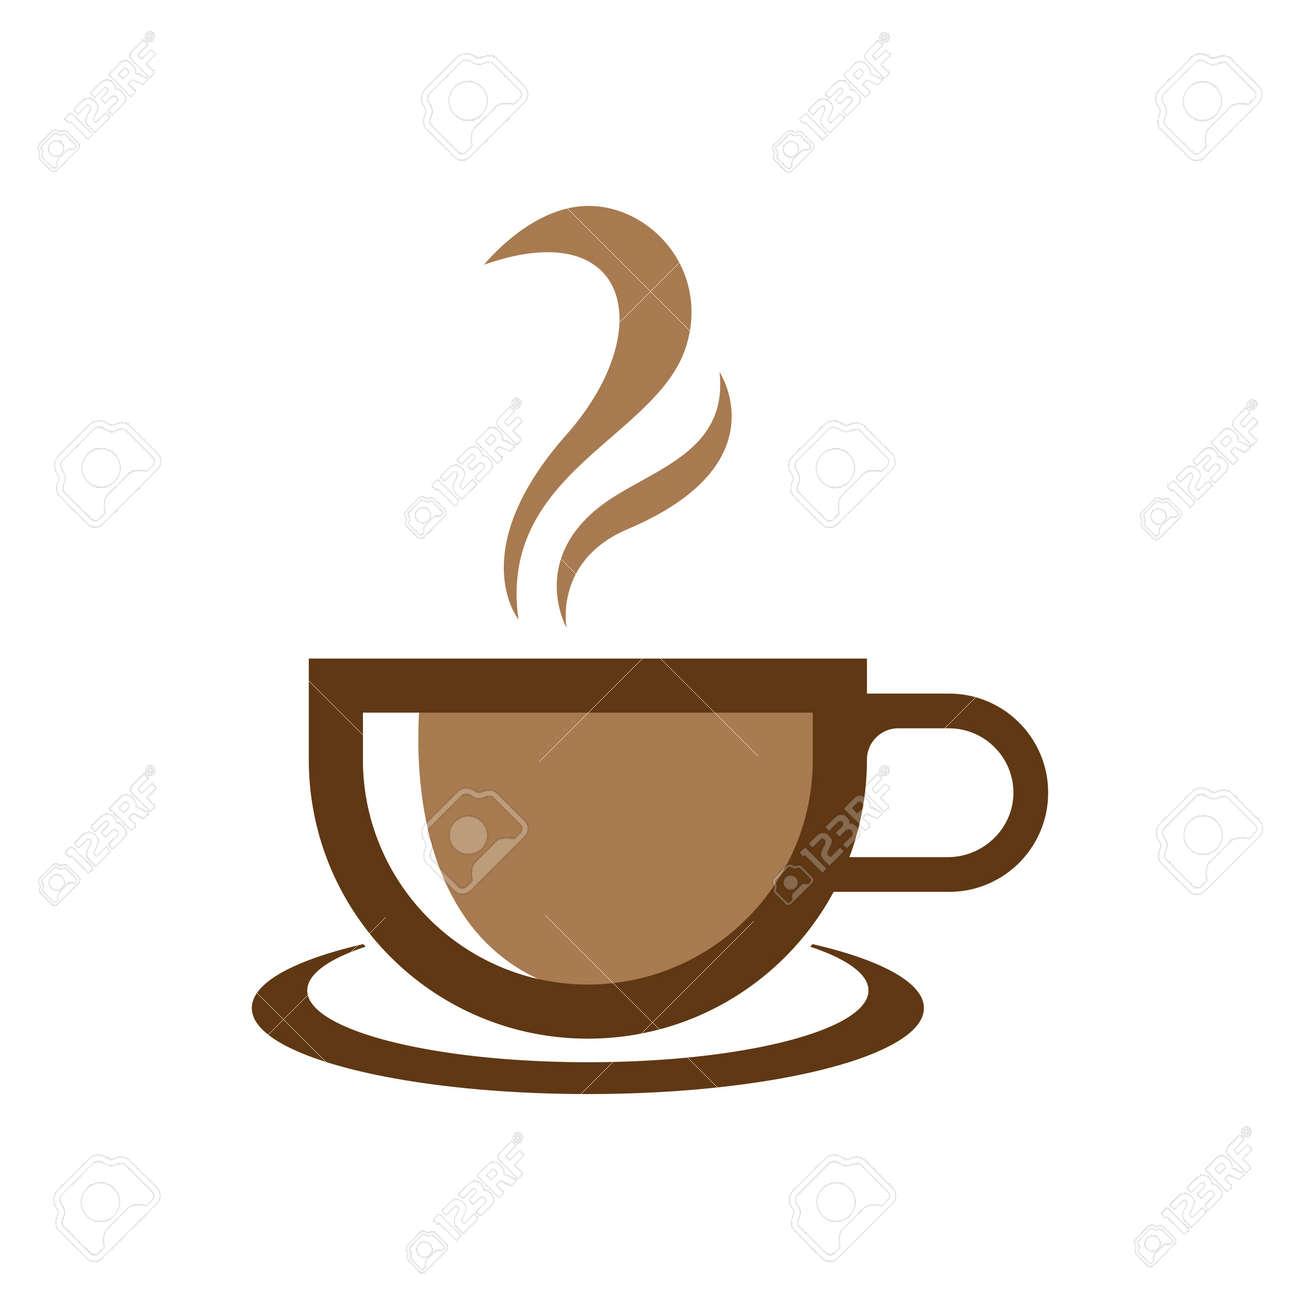 Coffee cup logo images illustration design - 167448835